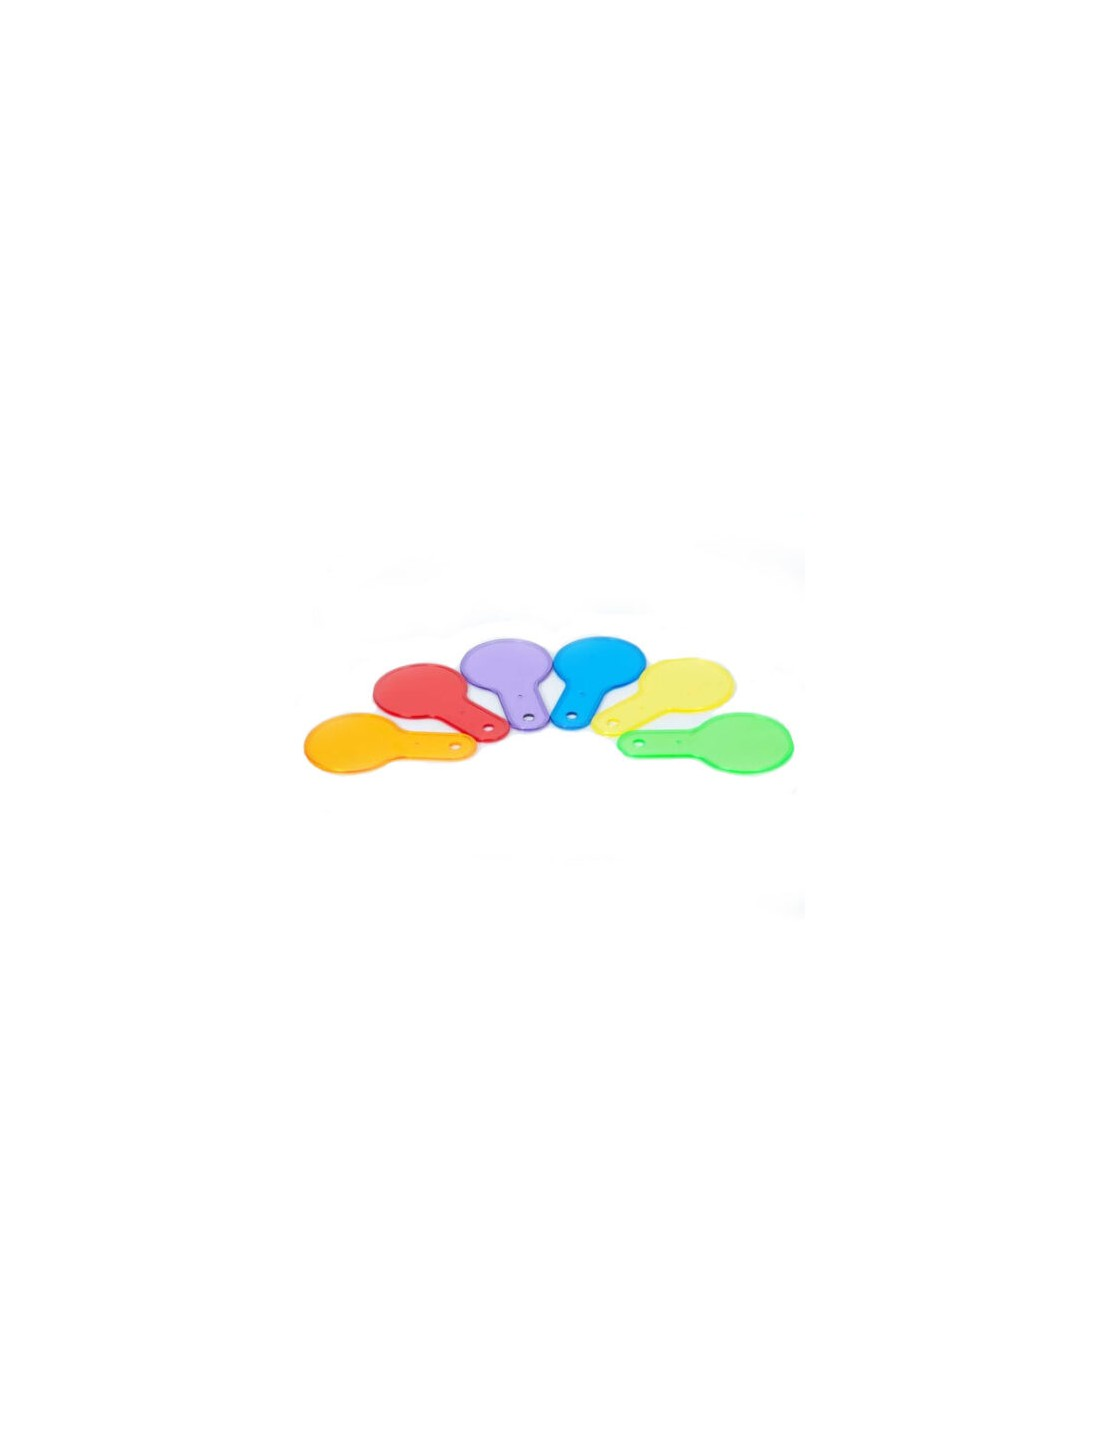 Paletas traslúcidas de colores. Tickit